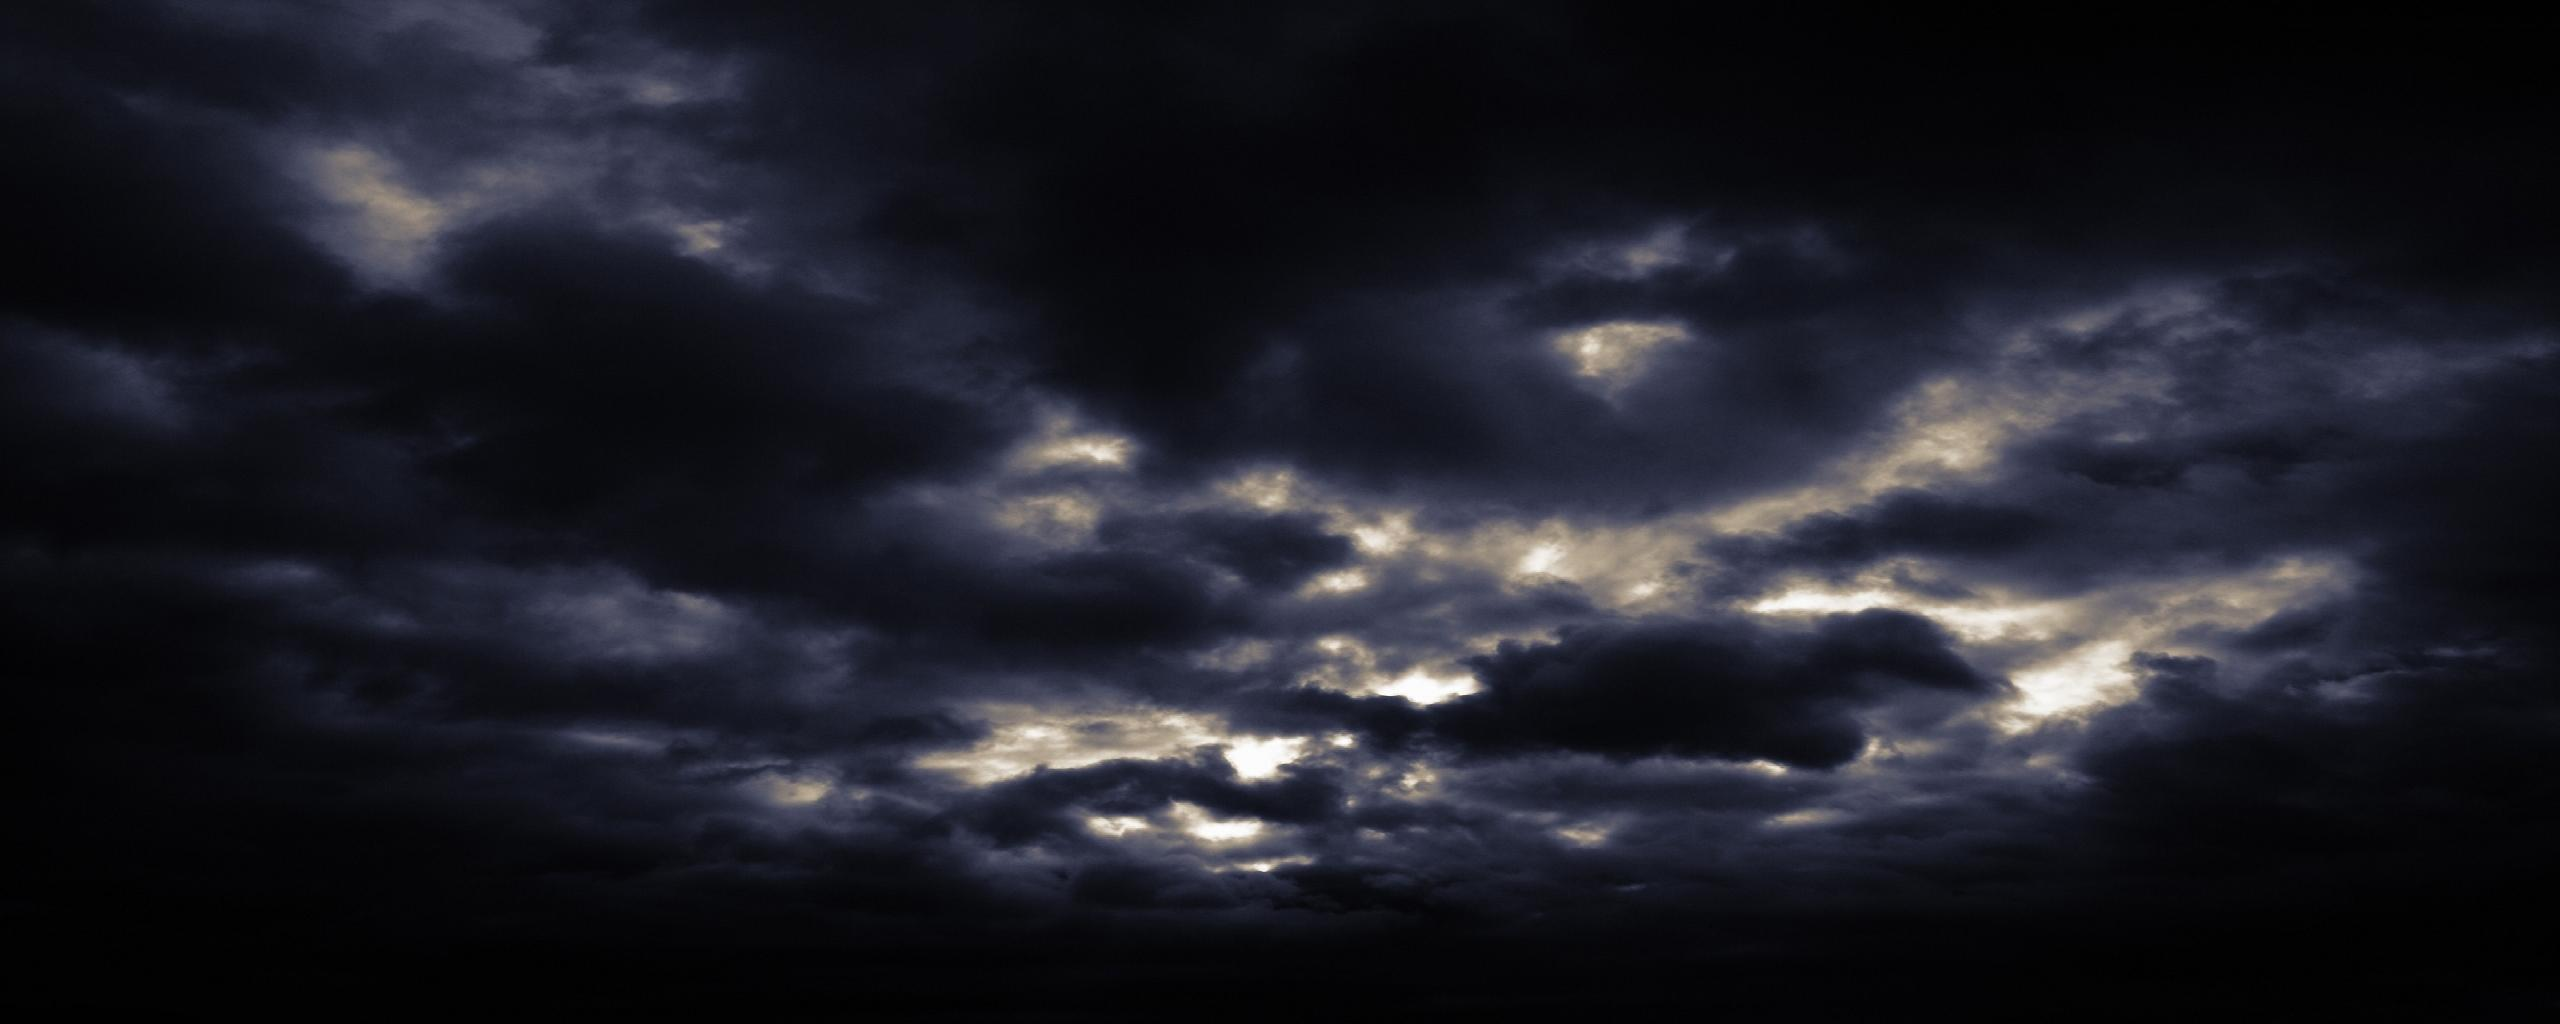 HD Dark Sky